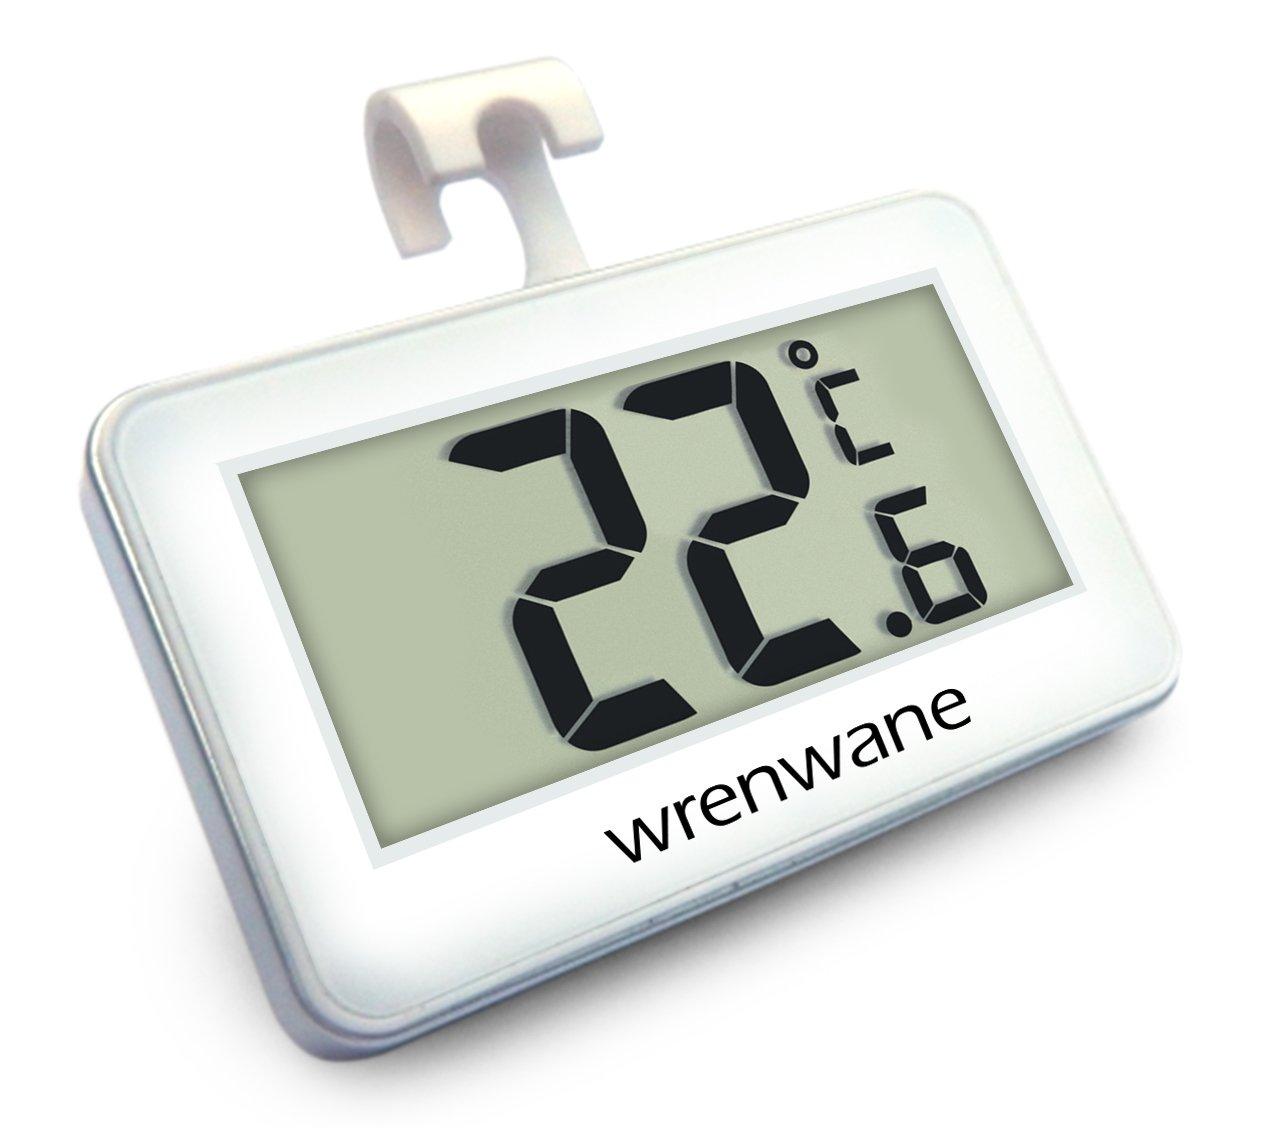 Wrenwane Digital Refrigerator Freezer Room Thermometer, No Frills Simple Operation, White